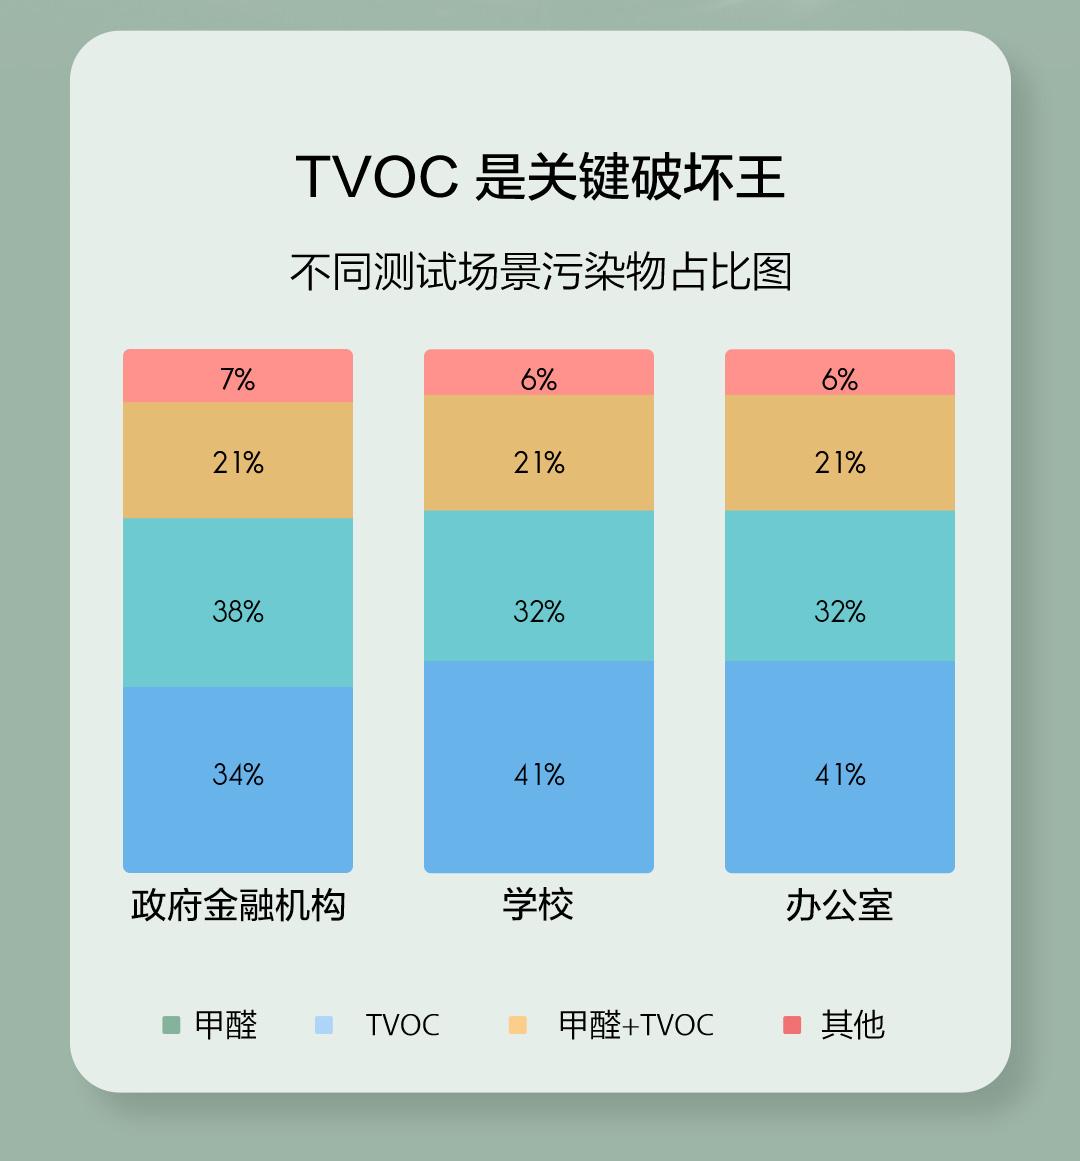 TVOC 空气健康伴侣